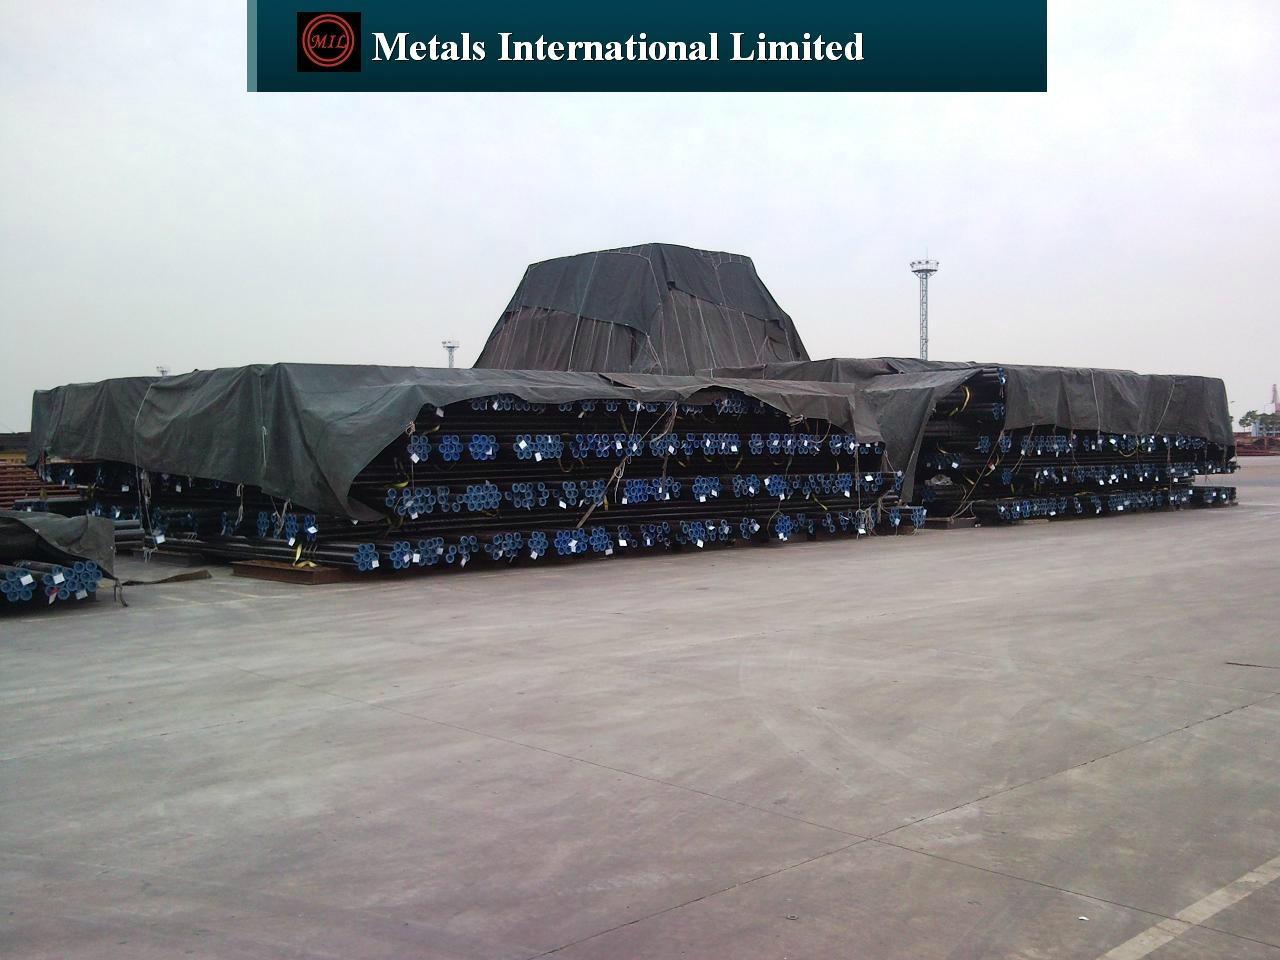 ASTM A106/ASTM A179,ASTM A192,ASTM A209,ASTM 210,ASTM A213,EN10216 Boiler Tube  6